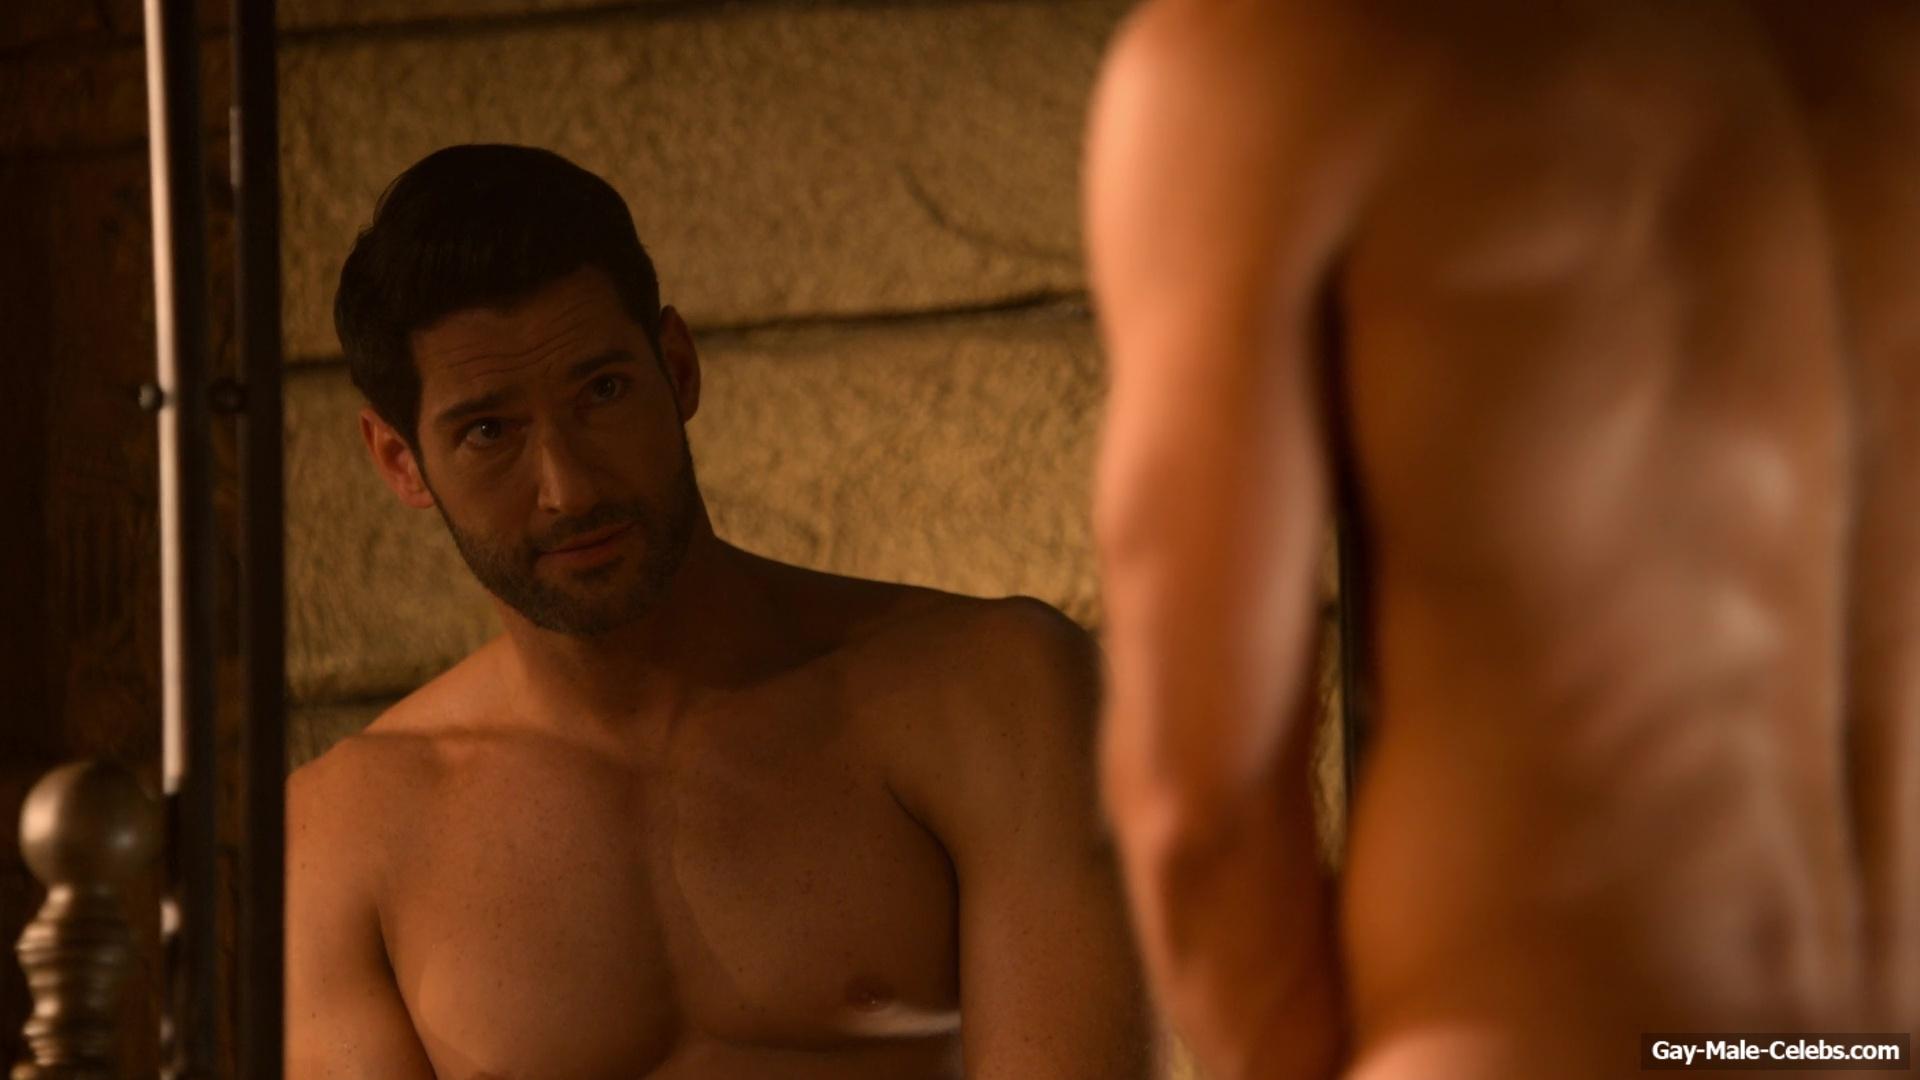 Tom Ellis Nude Hot Nsfw Photo Clips Pics Exposed